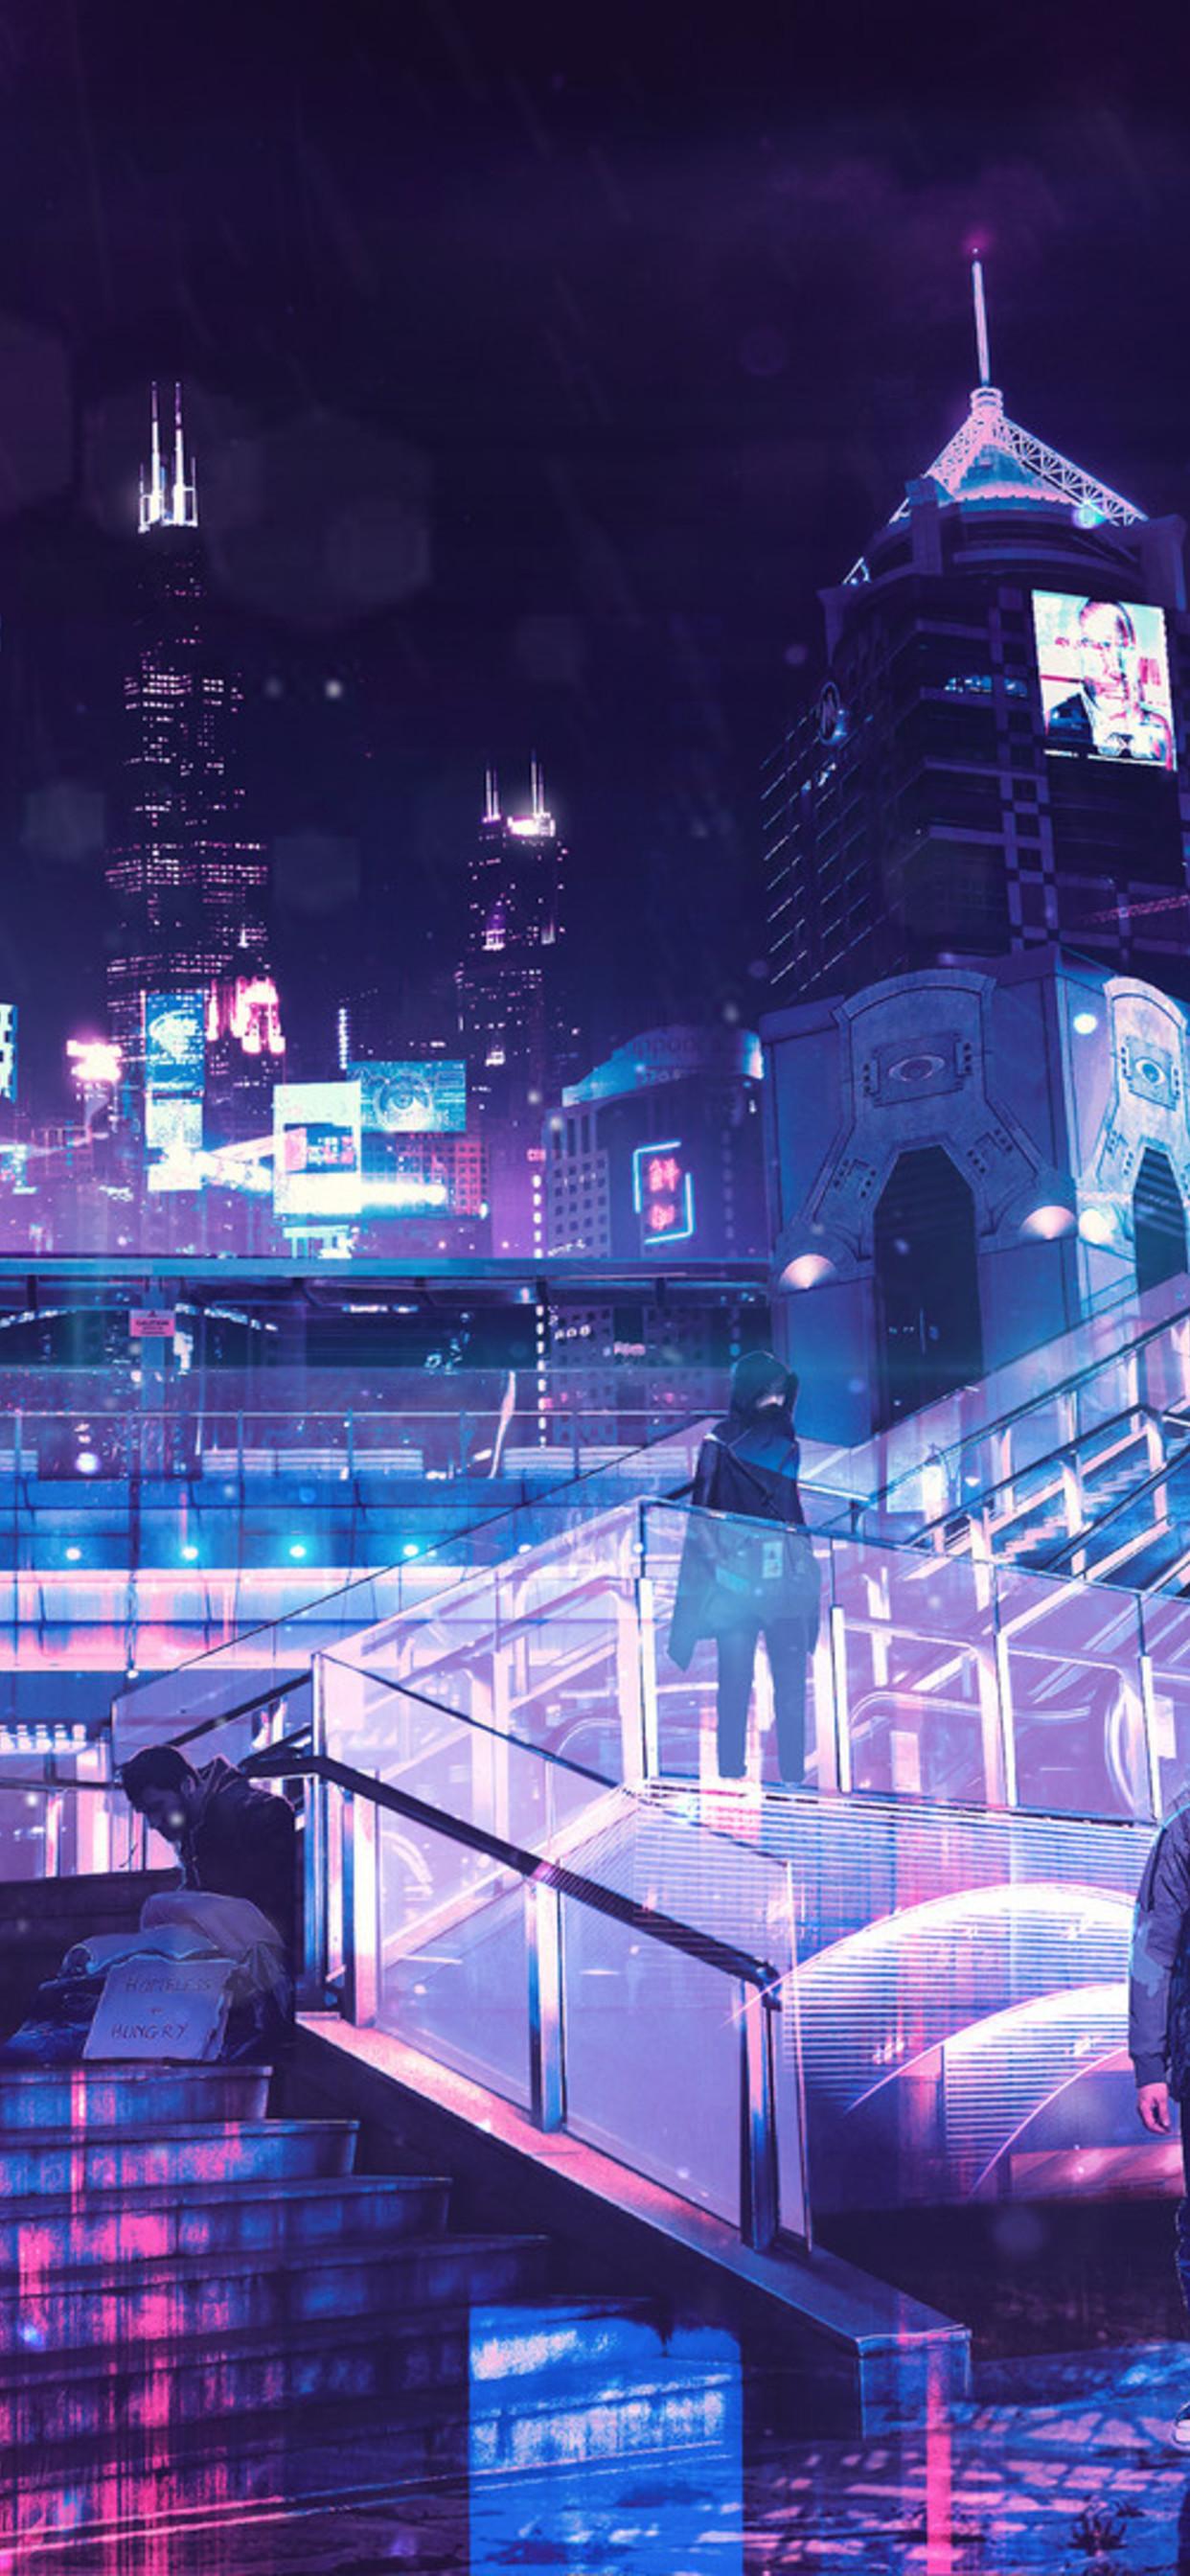 Neon City Wallpaper : wallpaper, Wallpaper, Iphone